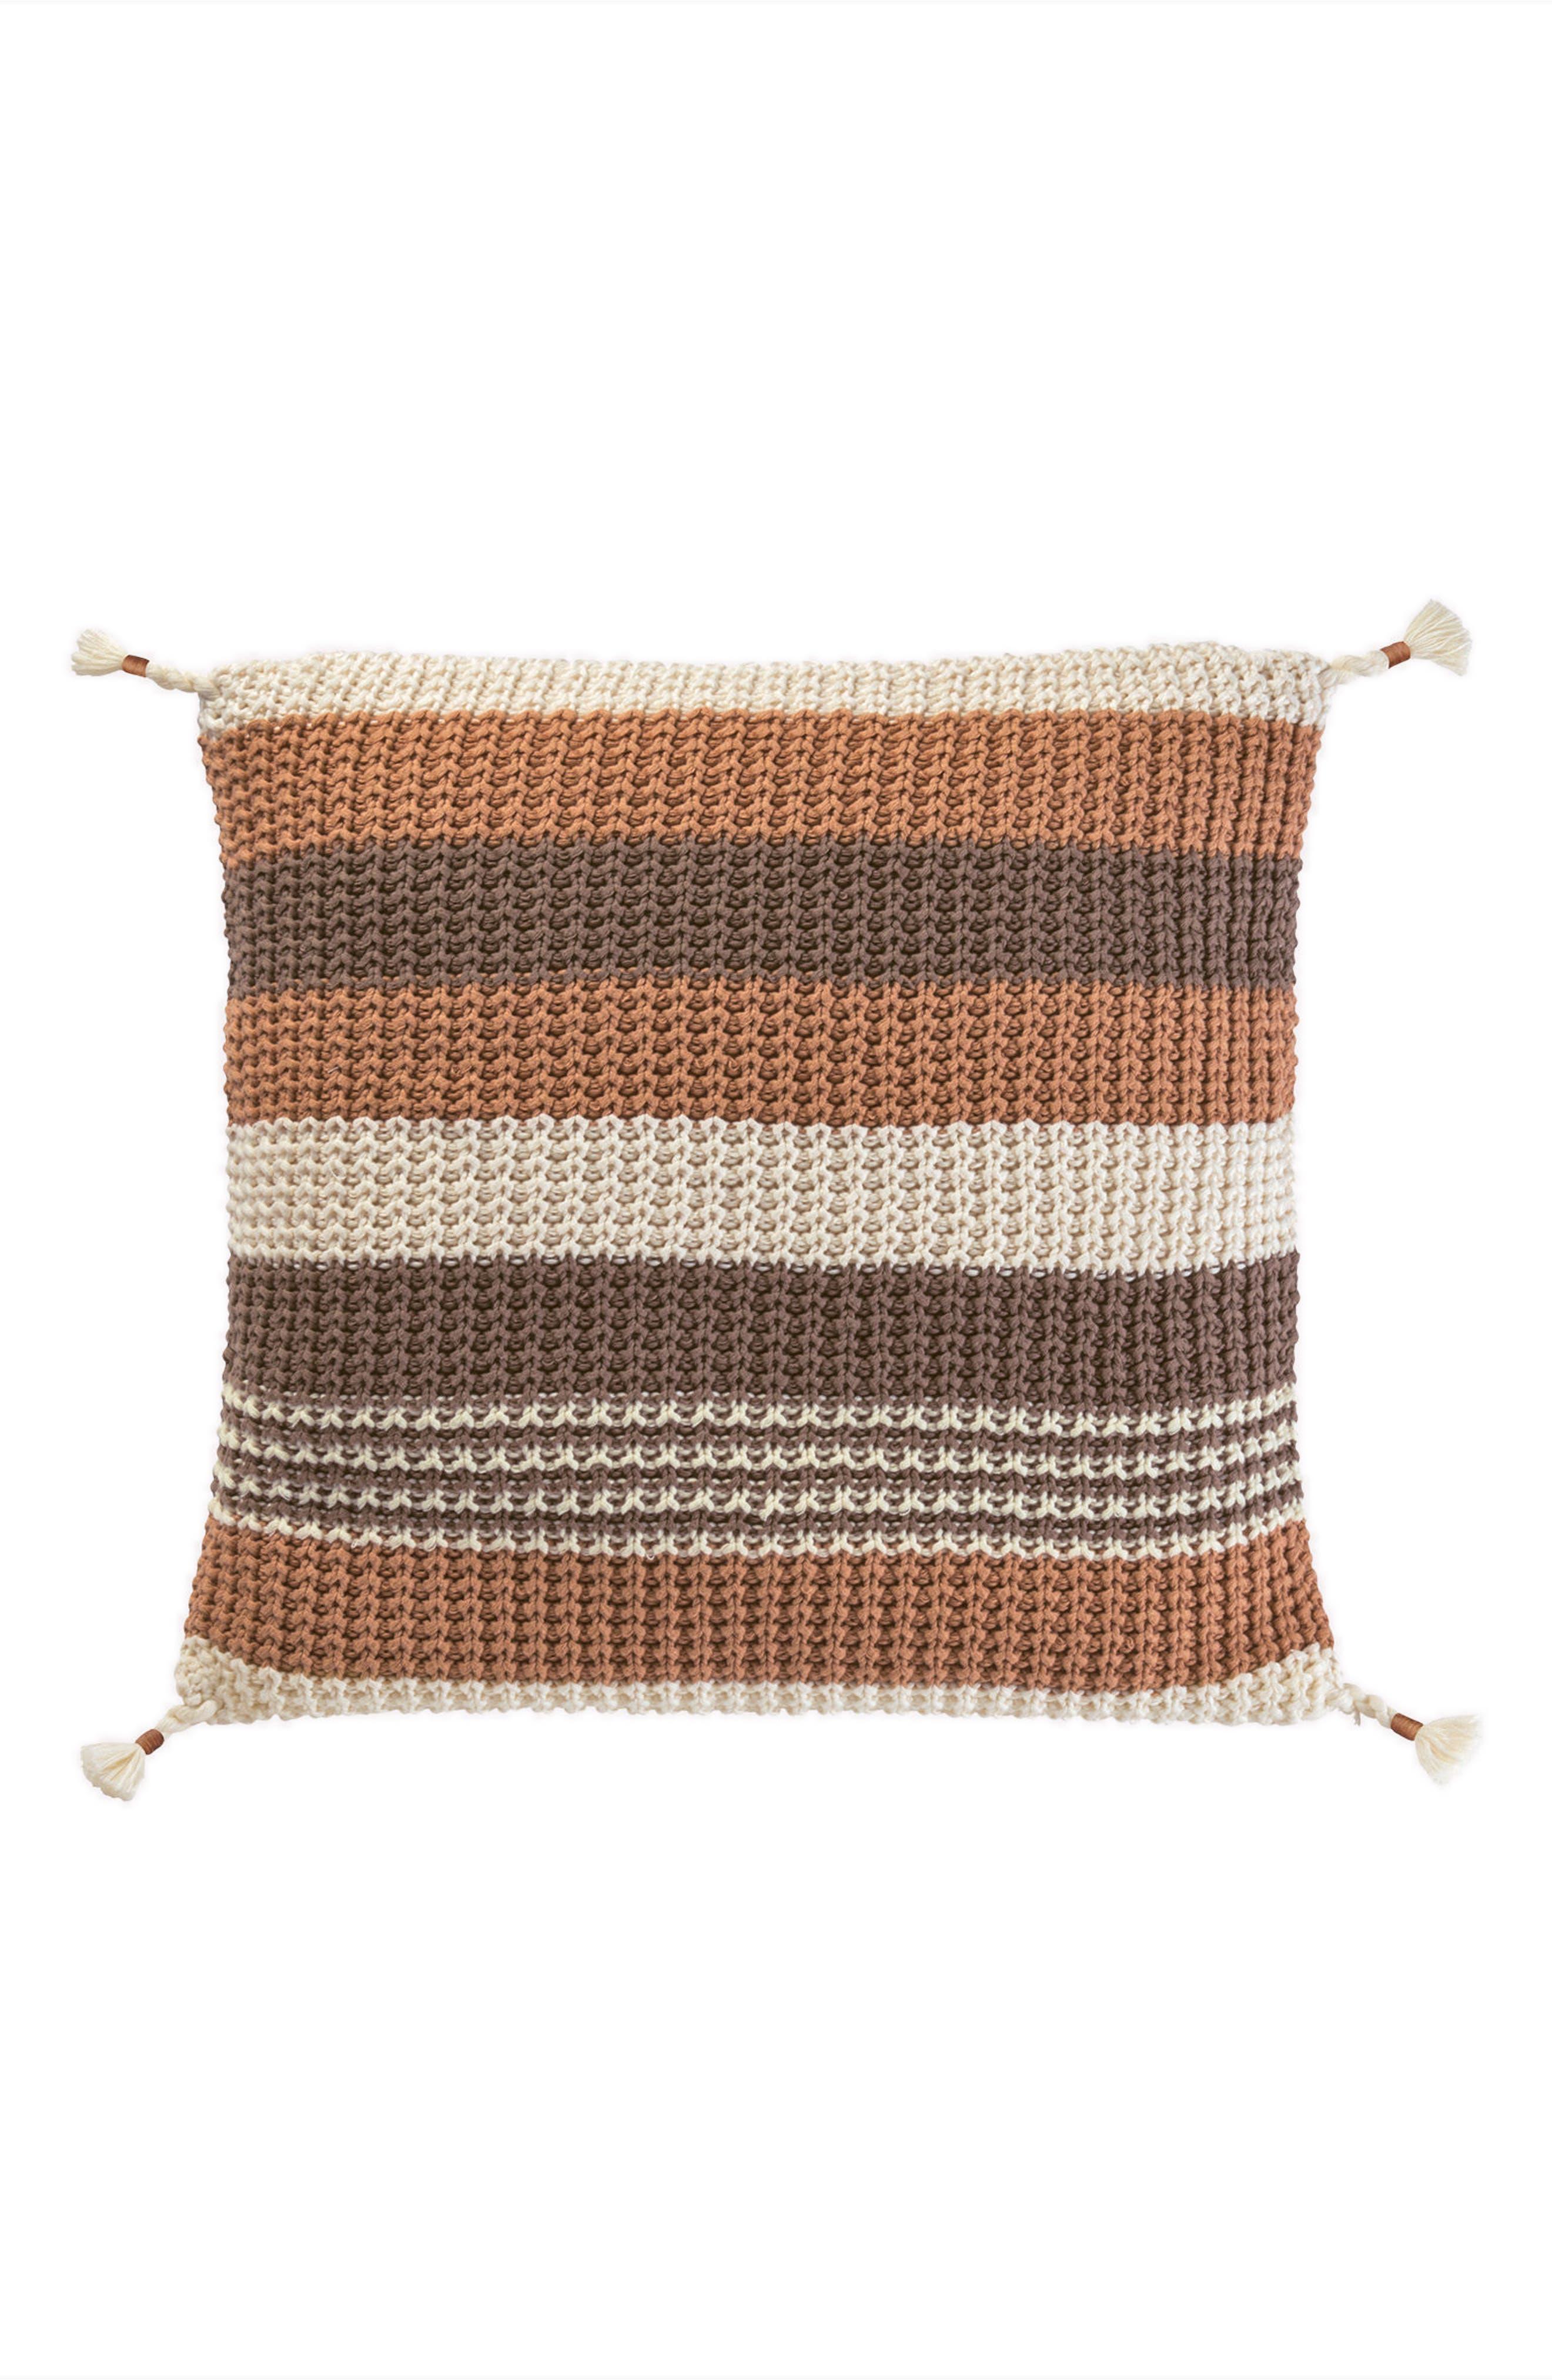 Horizon Stripe Knit Accent Pillow,                             Main thumbnail 1, color,                             Tan Multi